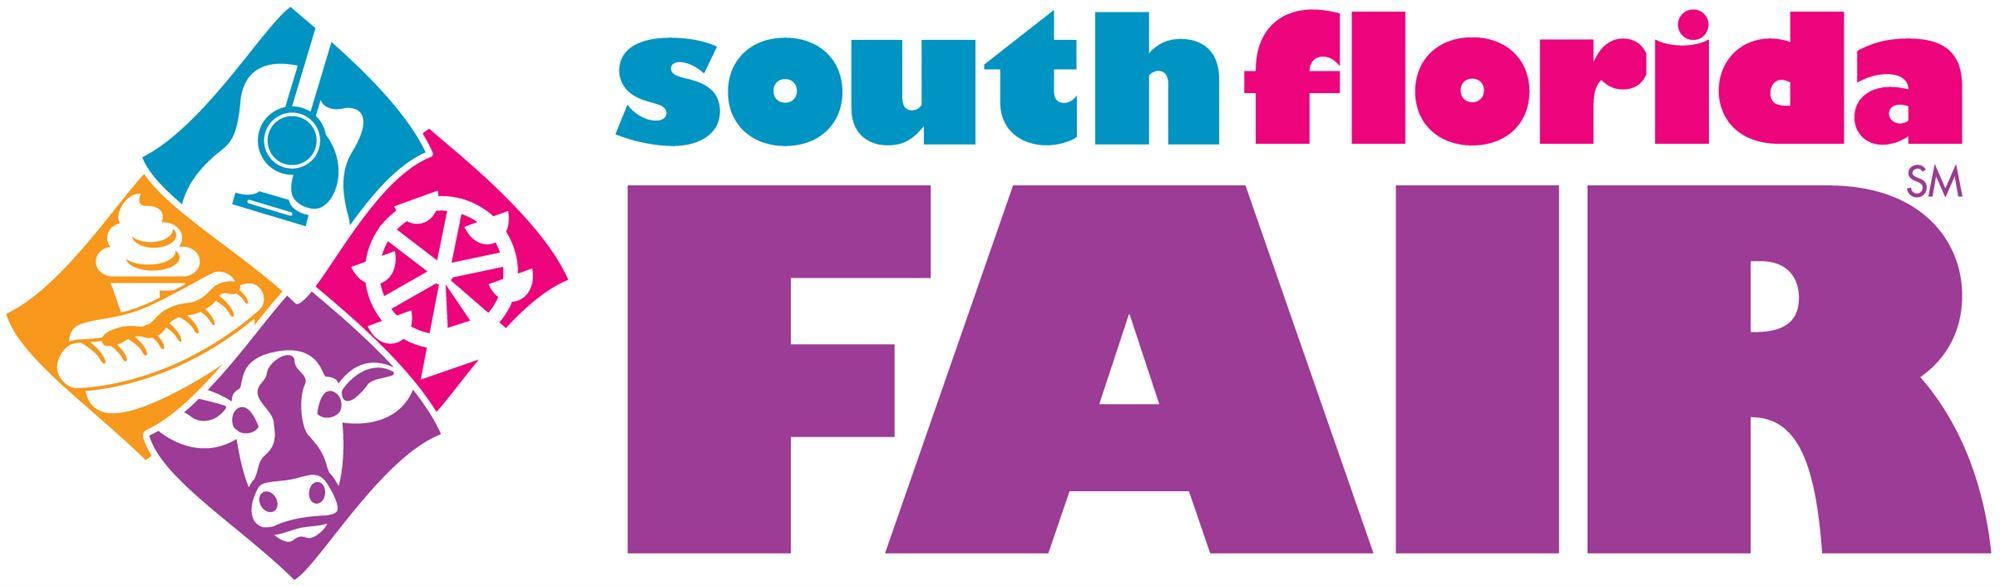 South Florida Fair Announces 2018 National Entertainment Inside Florida State Gairground Calendar